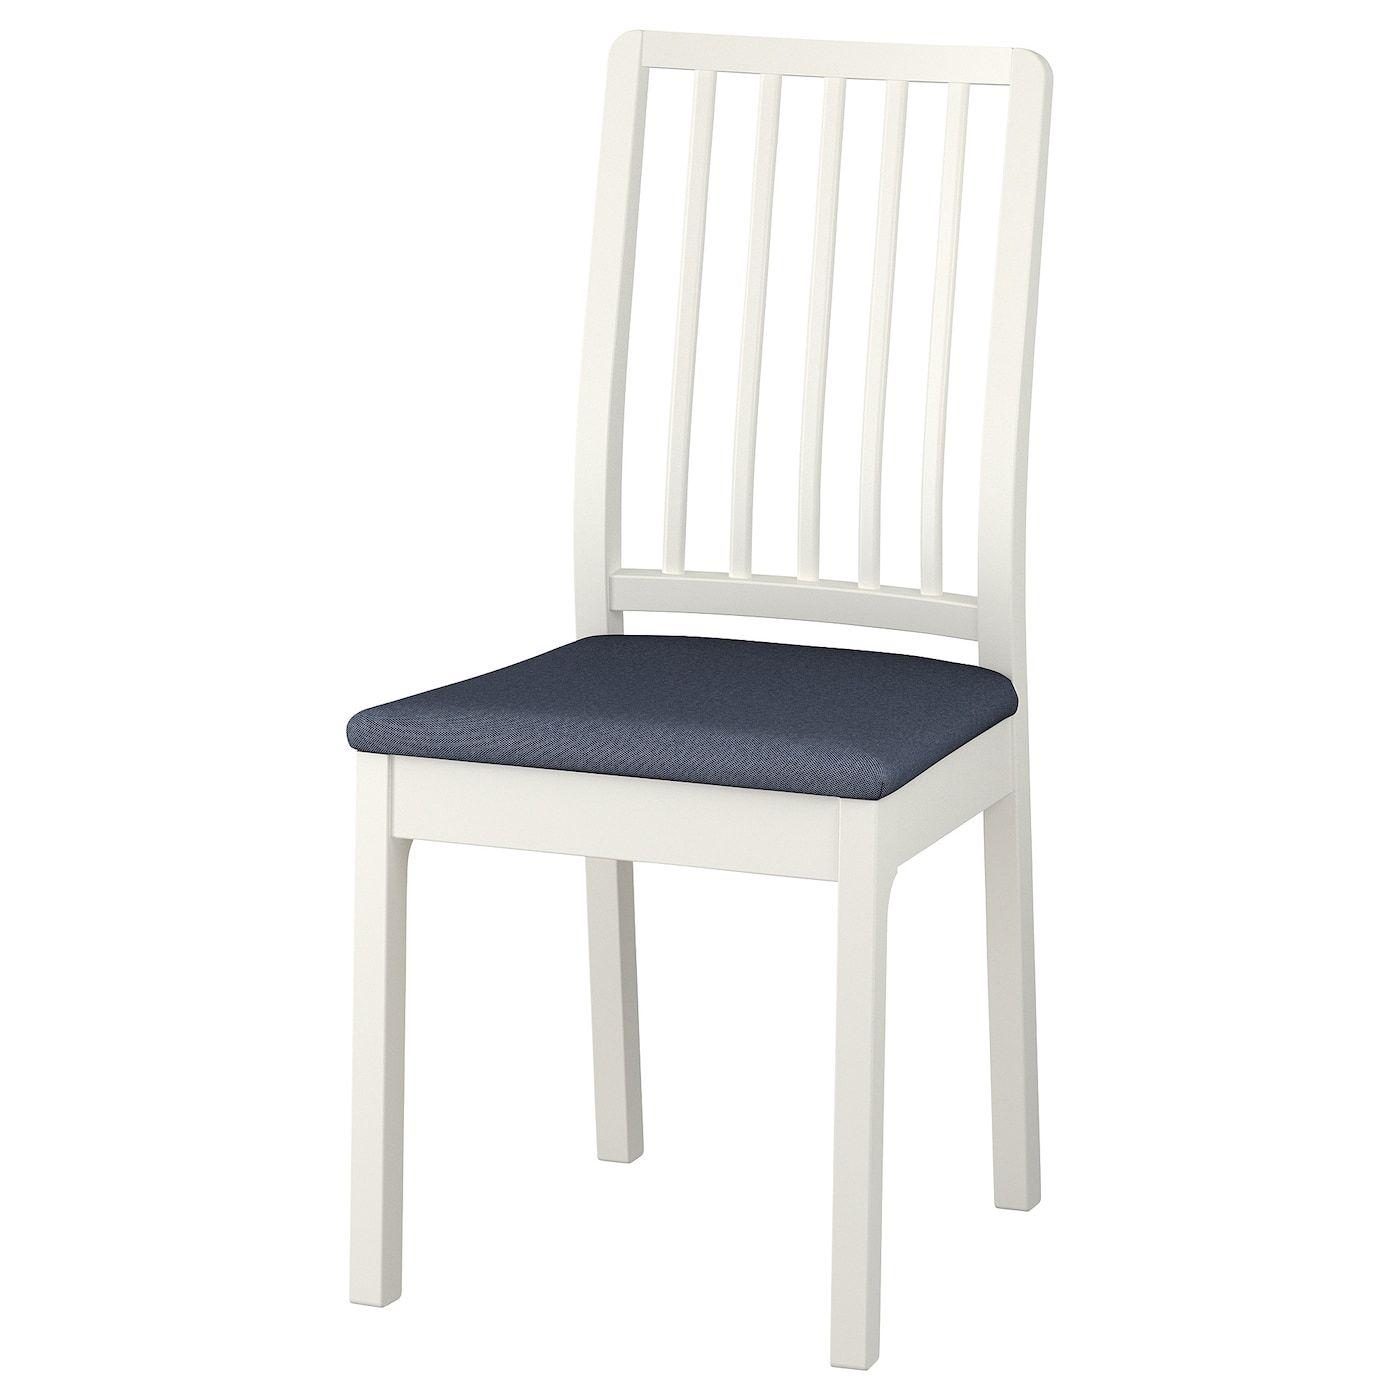 Ekedalen Stuhl Weiss Orrsta Schwarzblau Ikea Esszimmerstuhle